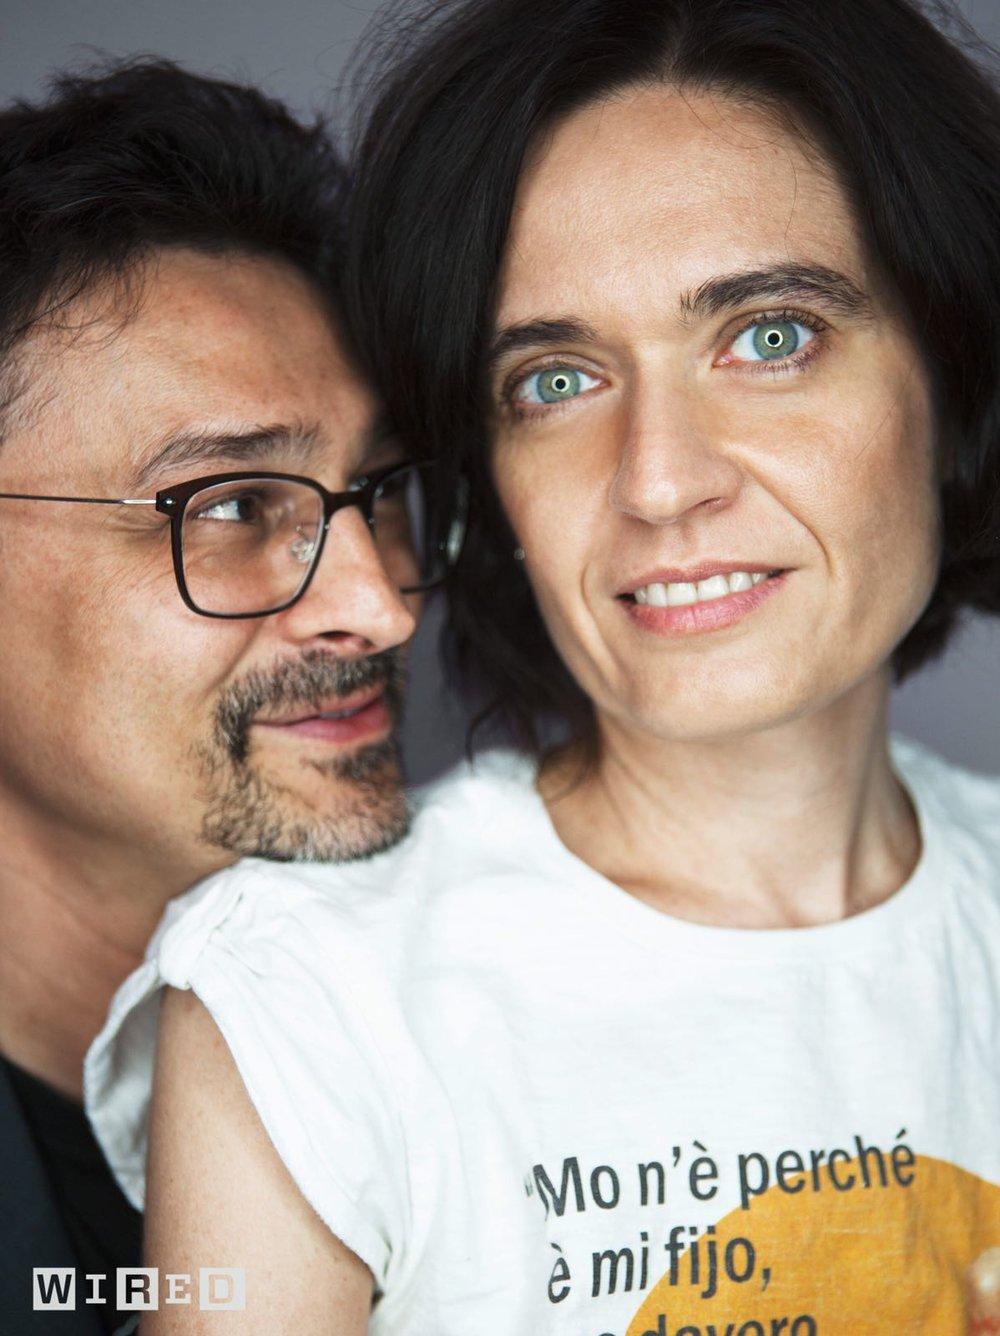 roberdan&Franci@wired.jpg